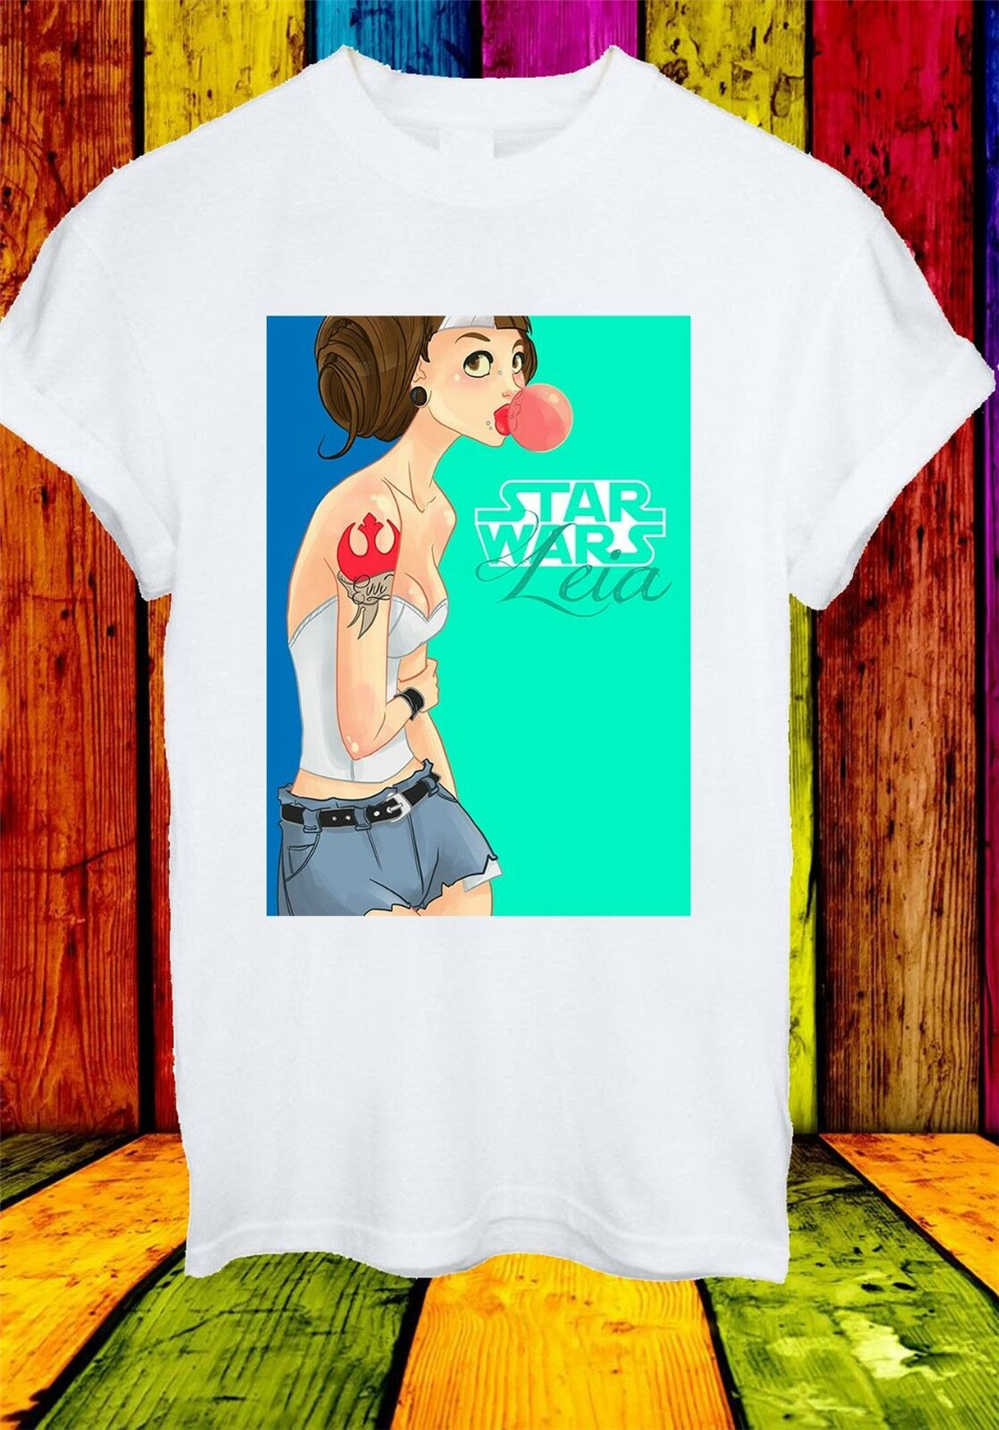 Star Wars Princess Leia Budak Pemberontak Hipster Karet Unisex T Shirt Pria Wanita Kaos Musim Panas Pakaian Kasual